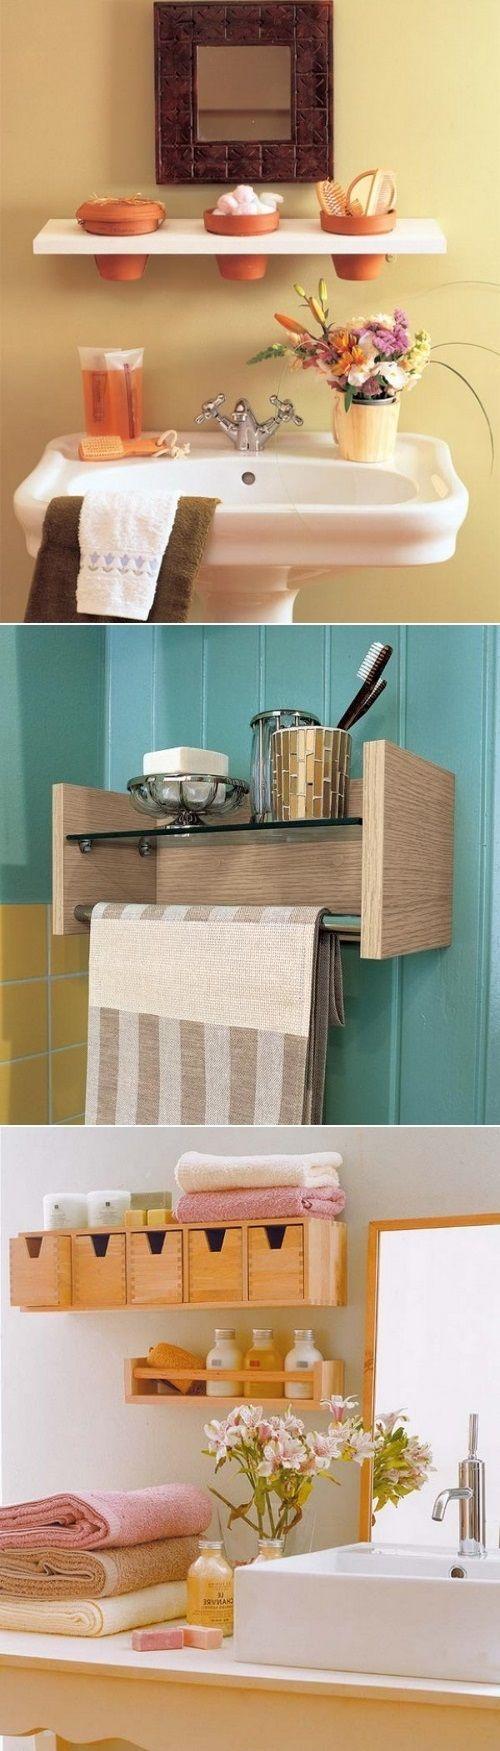 163 best bathroom ideas gadgets images on pinterest bathroom